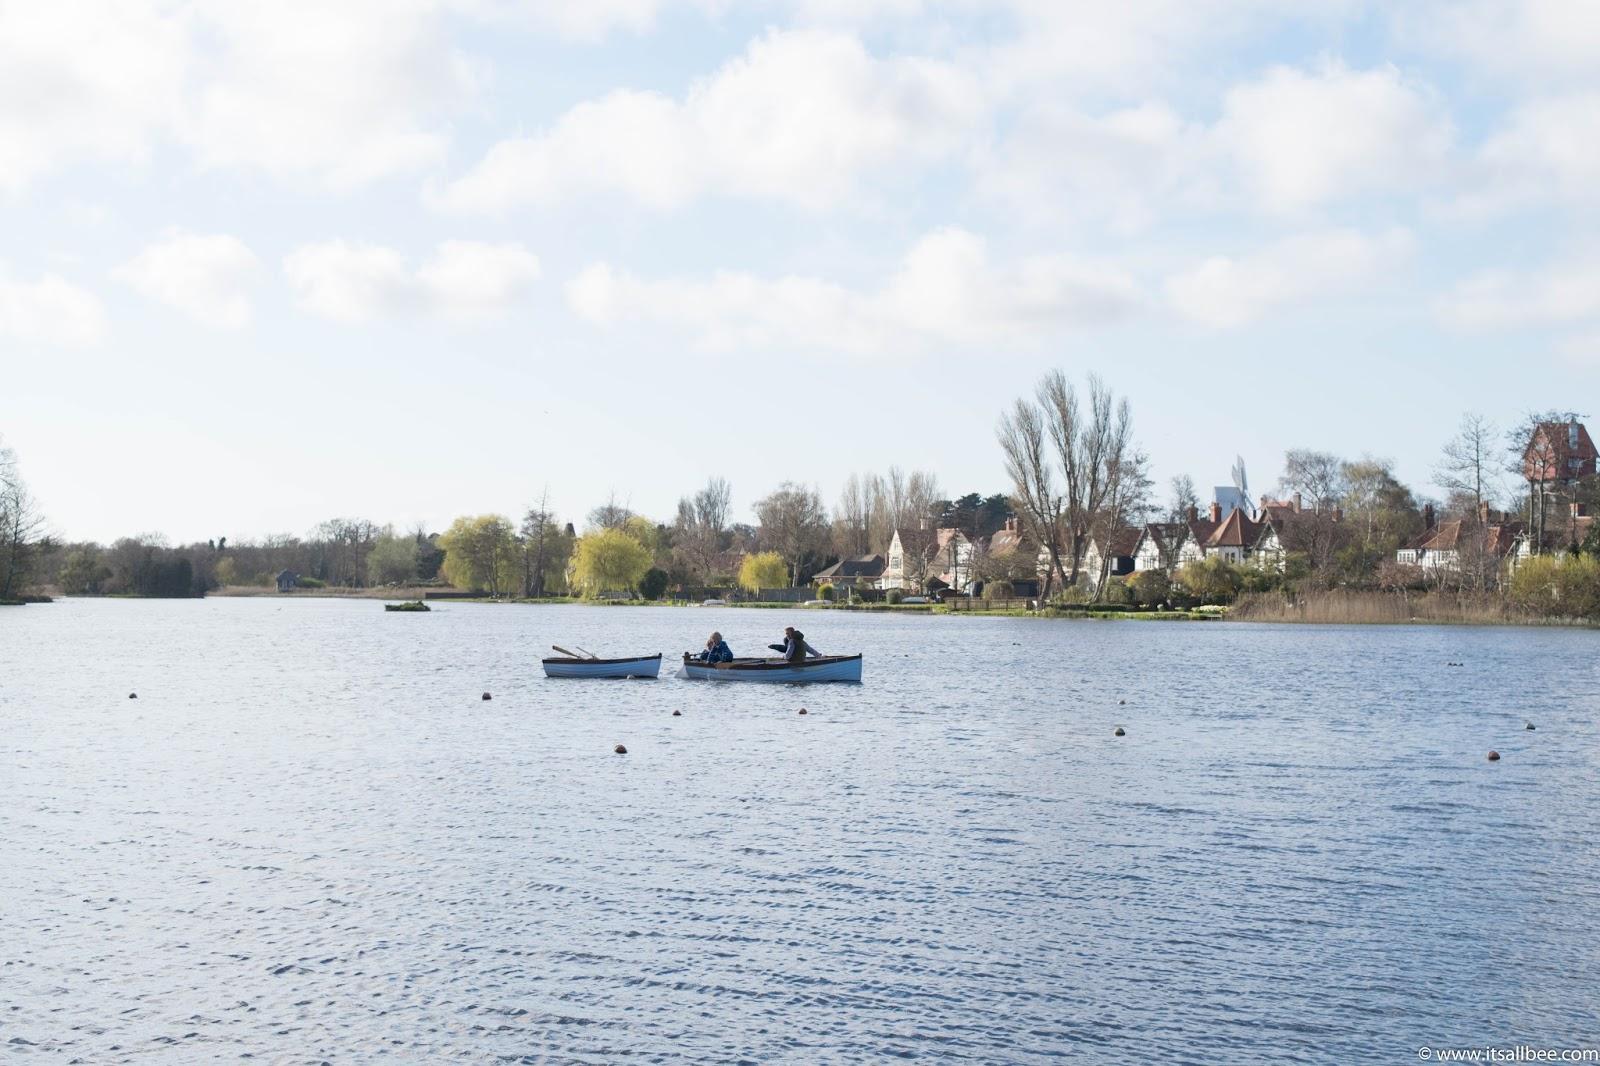 Thorpeness Lake | Thorpeness Boating Lake | Thorpeness boats